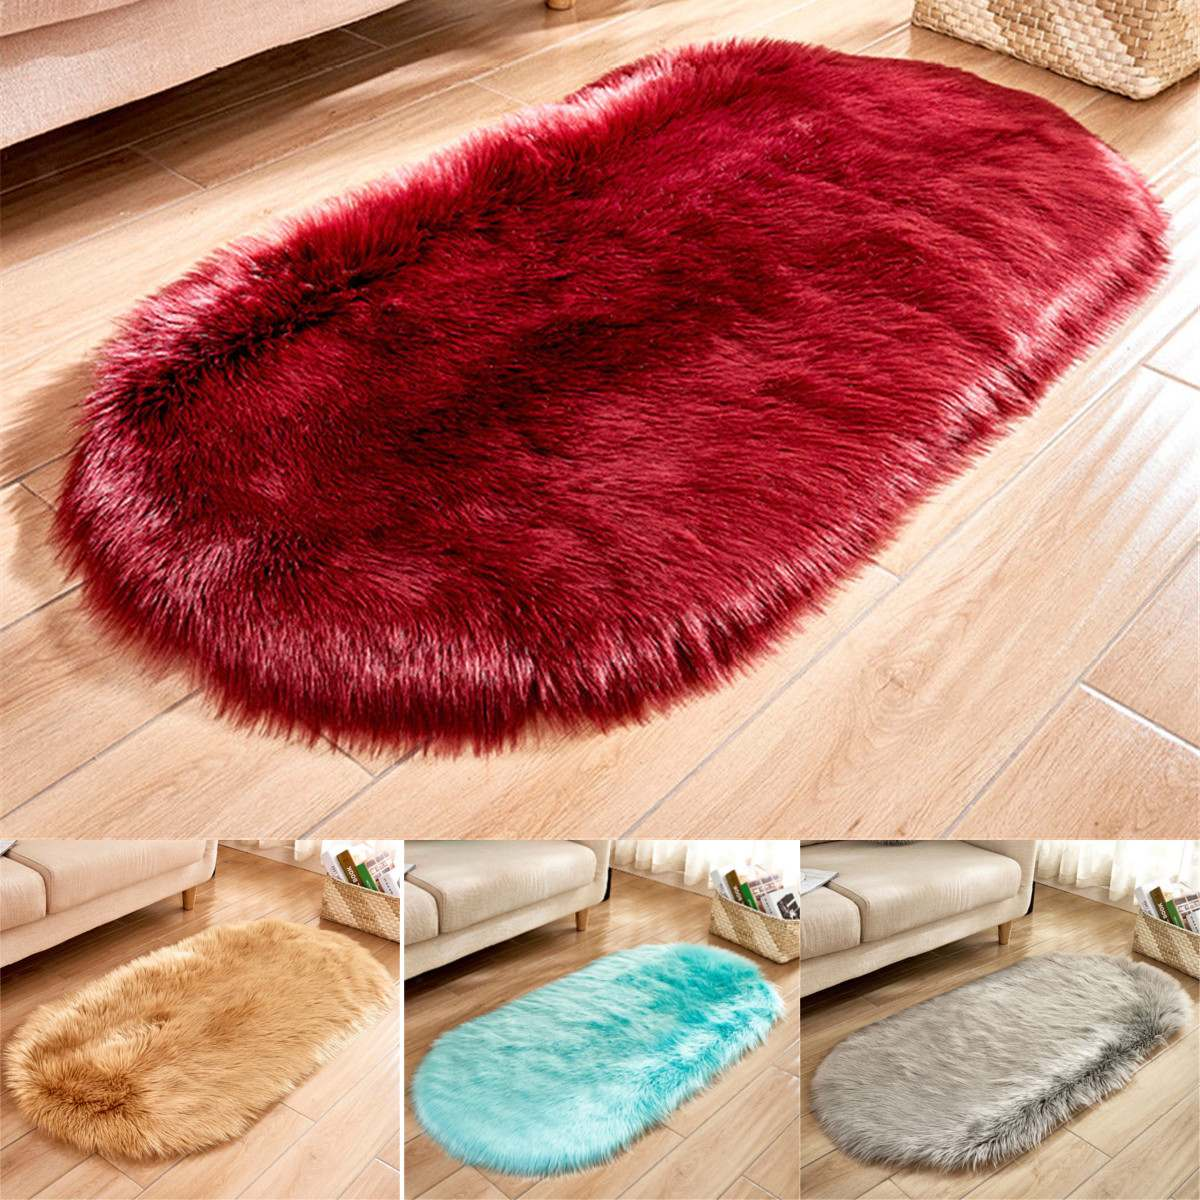 Aliexpress.com : Buy 120x50cm Non Slip Oval Plush Area Rug